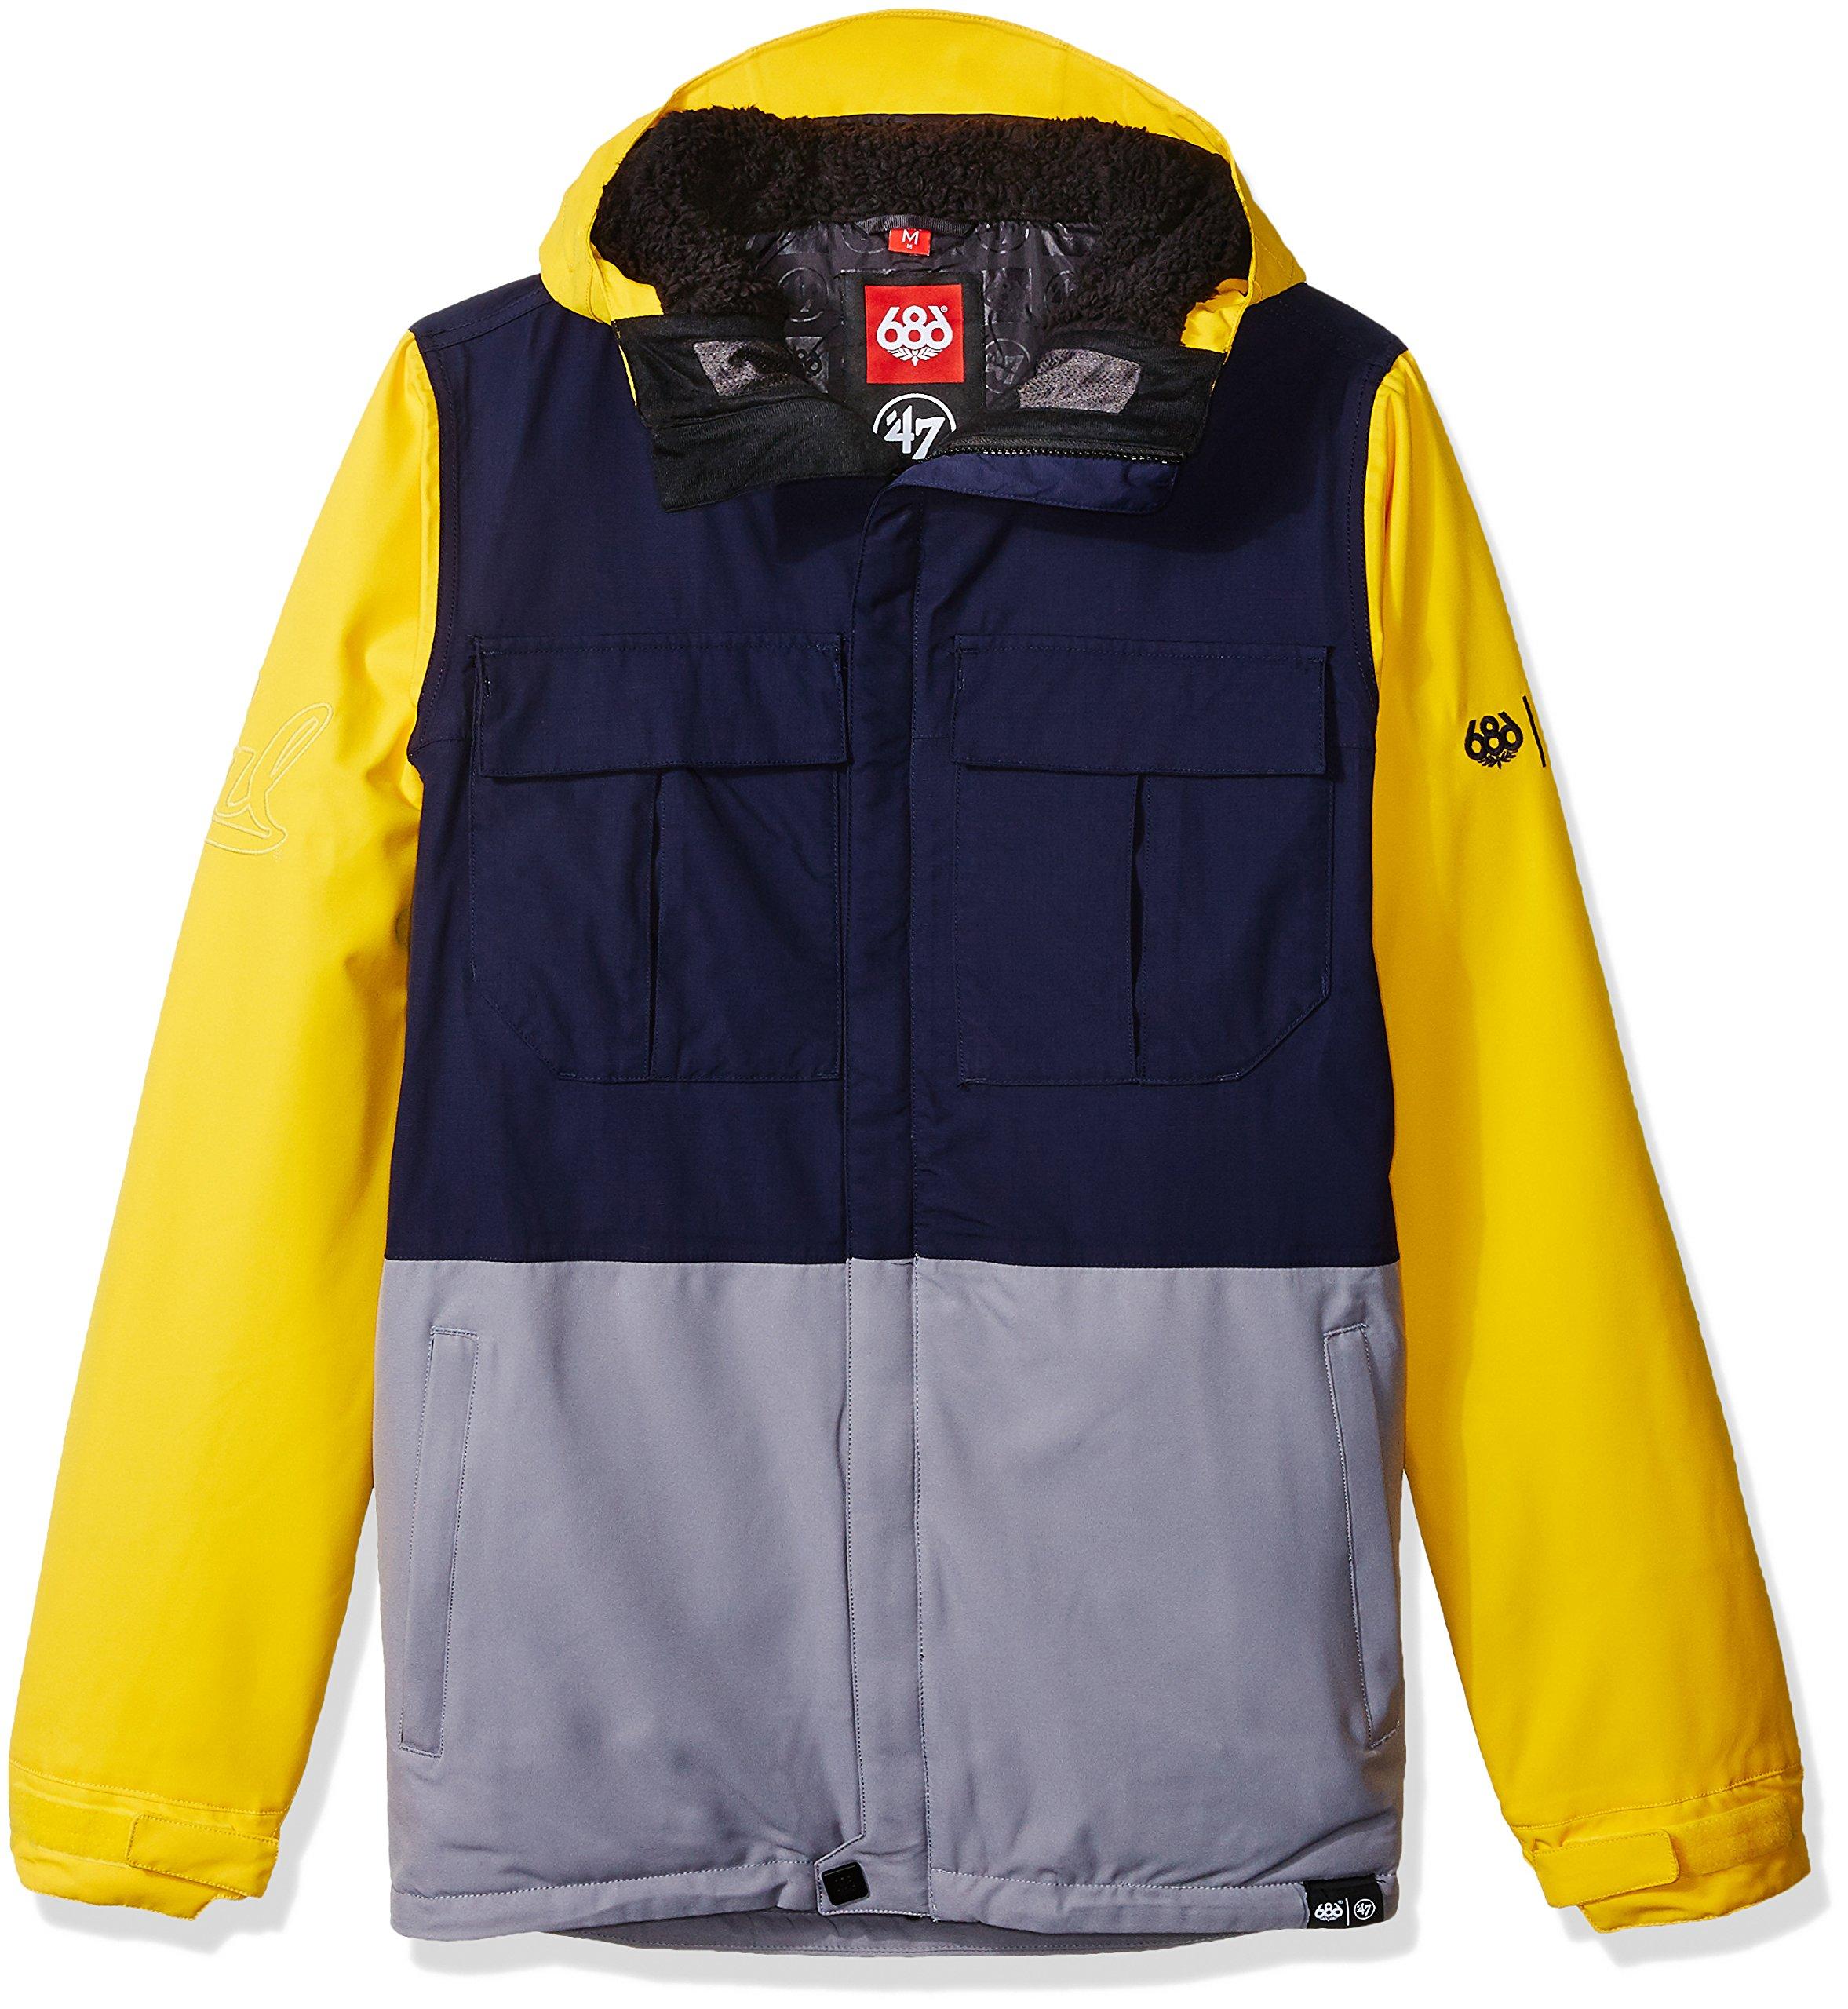 686x47 NCAA California Golden Bears Men's Victory Insulated Jacket, Small, Cal Blue